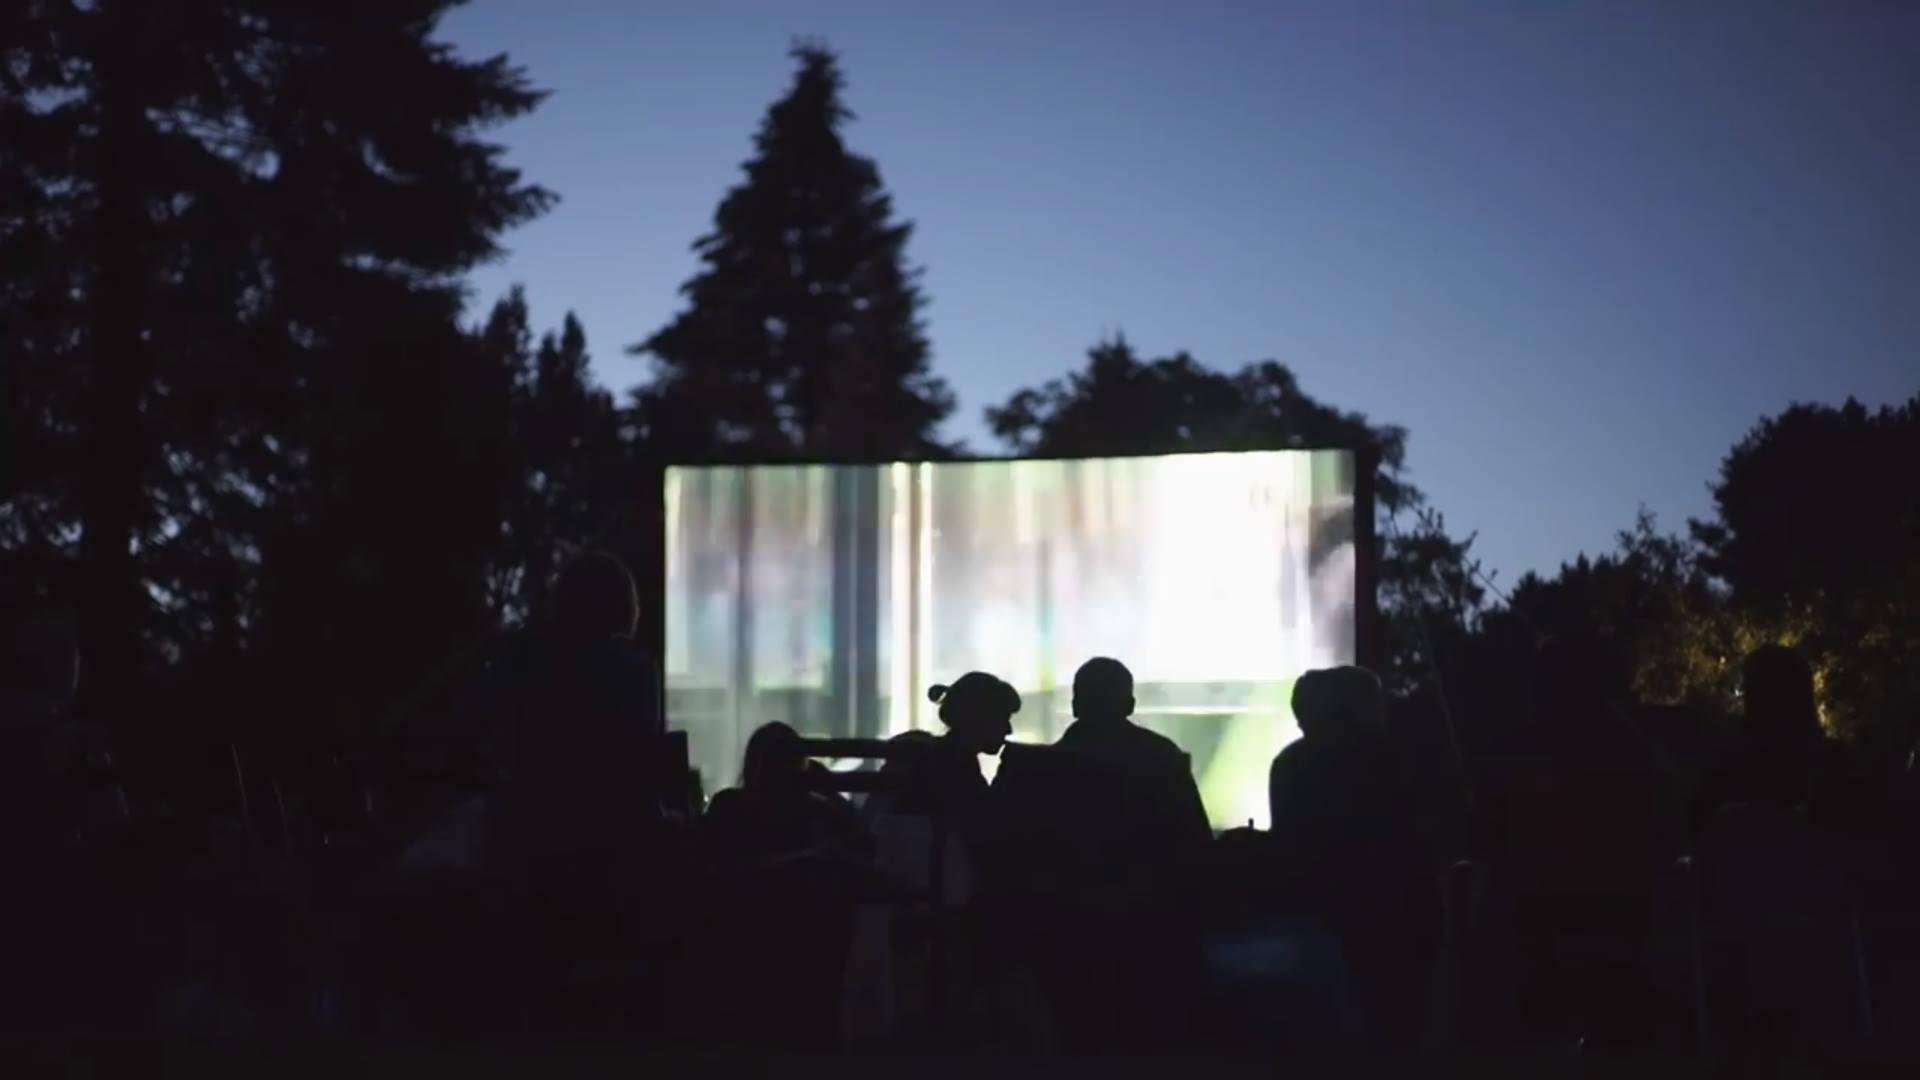 Lakeside Film Festival Vol.7 // POSTPONED TO 2021